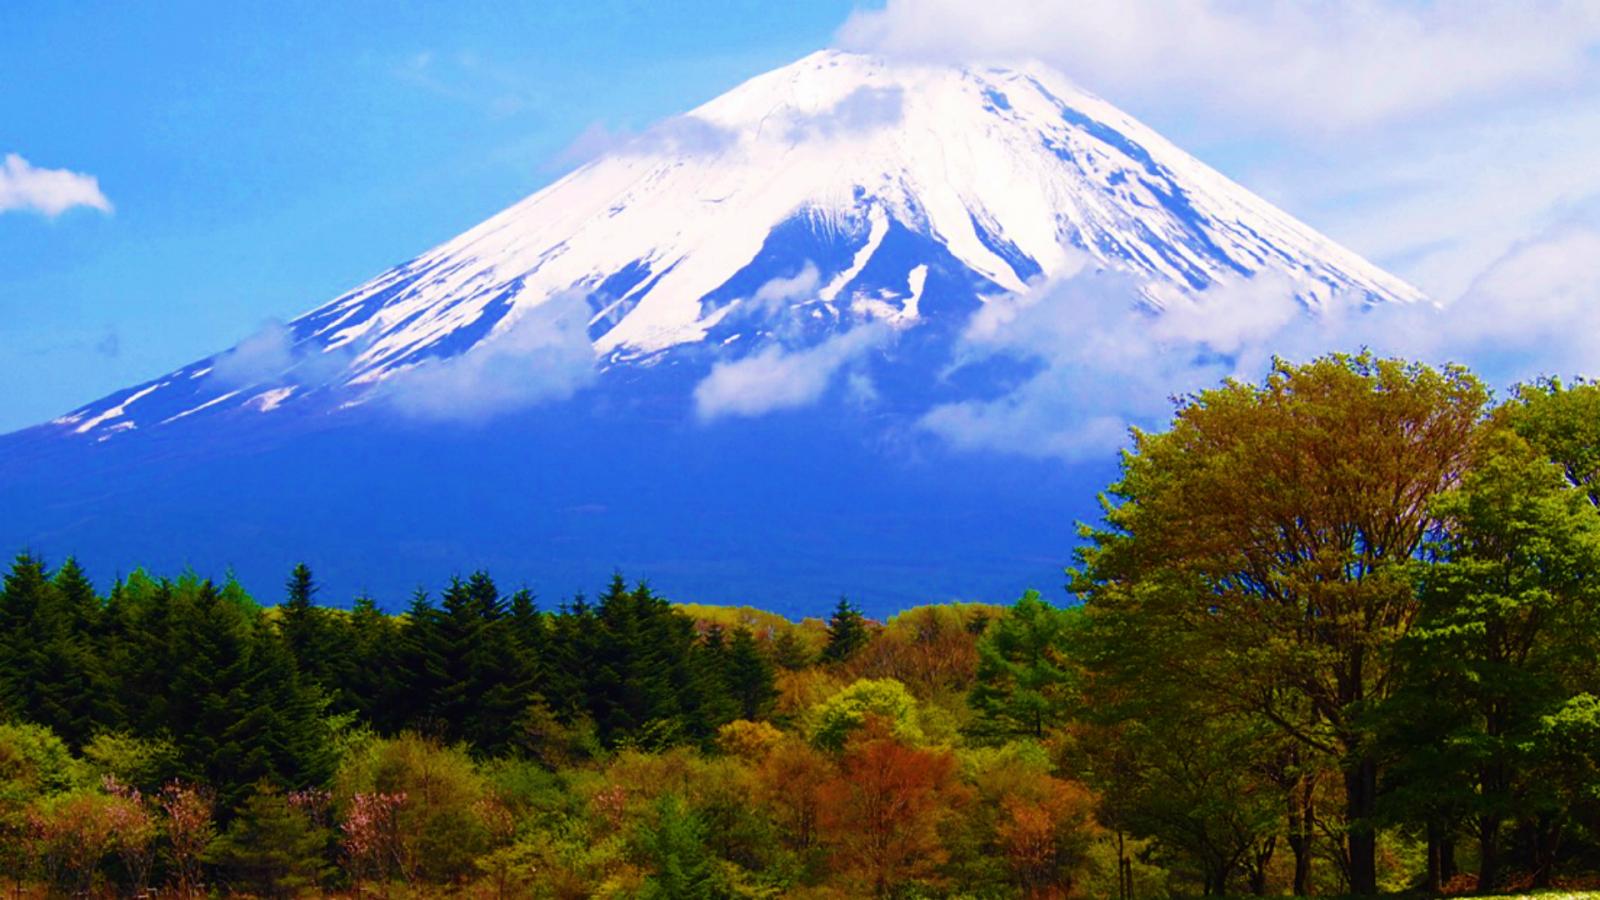 Mt Fuji Wallpaper Mount Mountain Travel HD Wallpapers 1920x1080